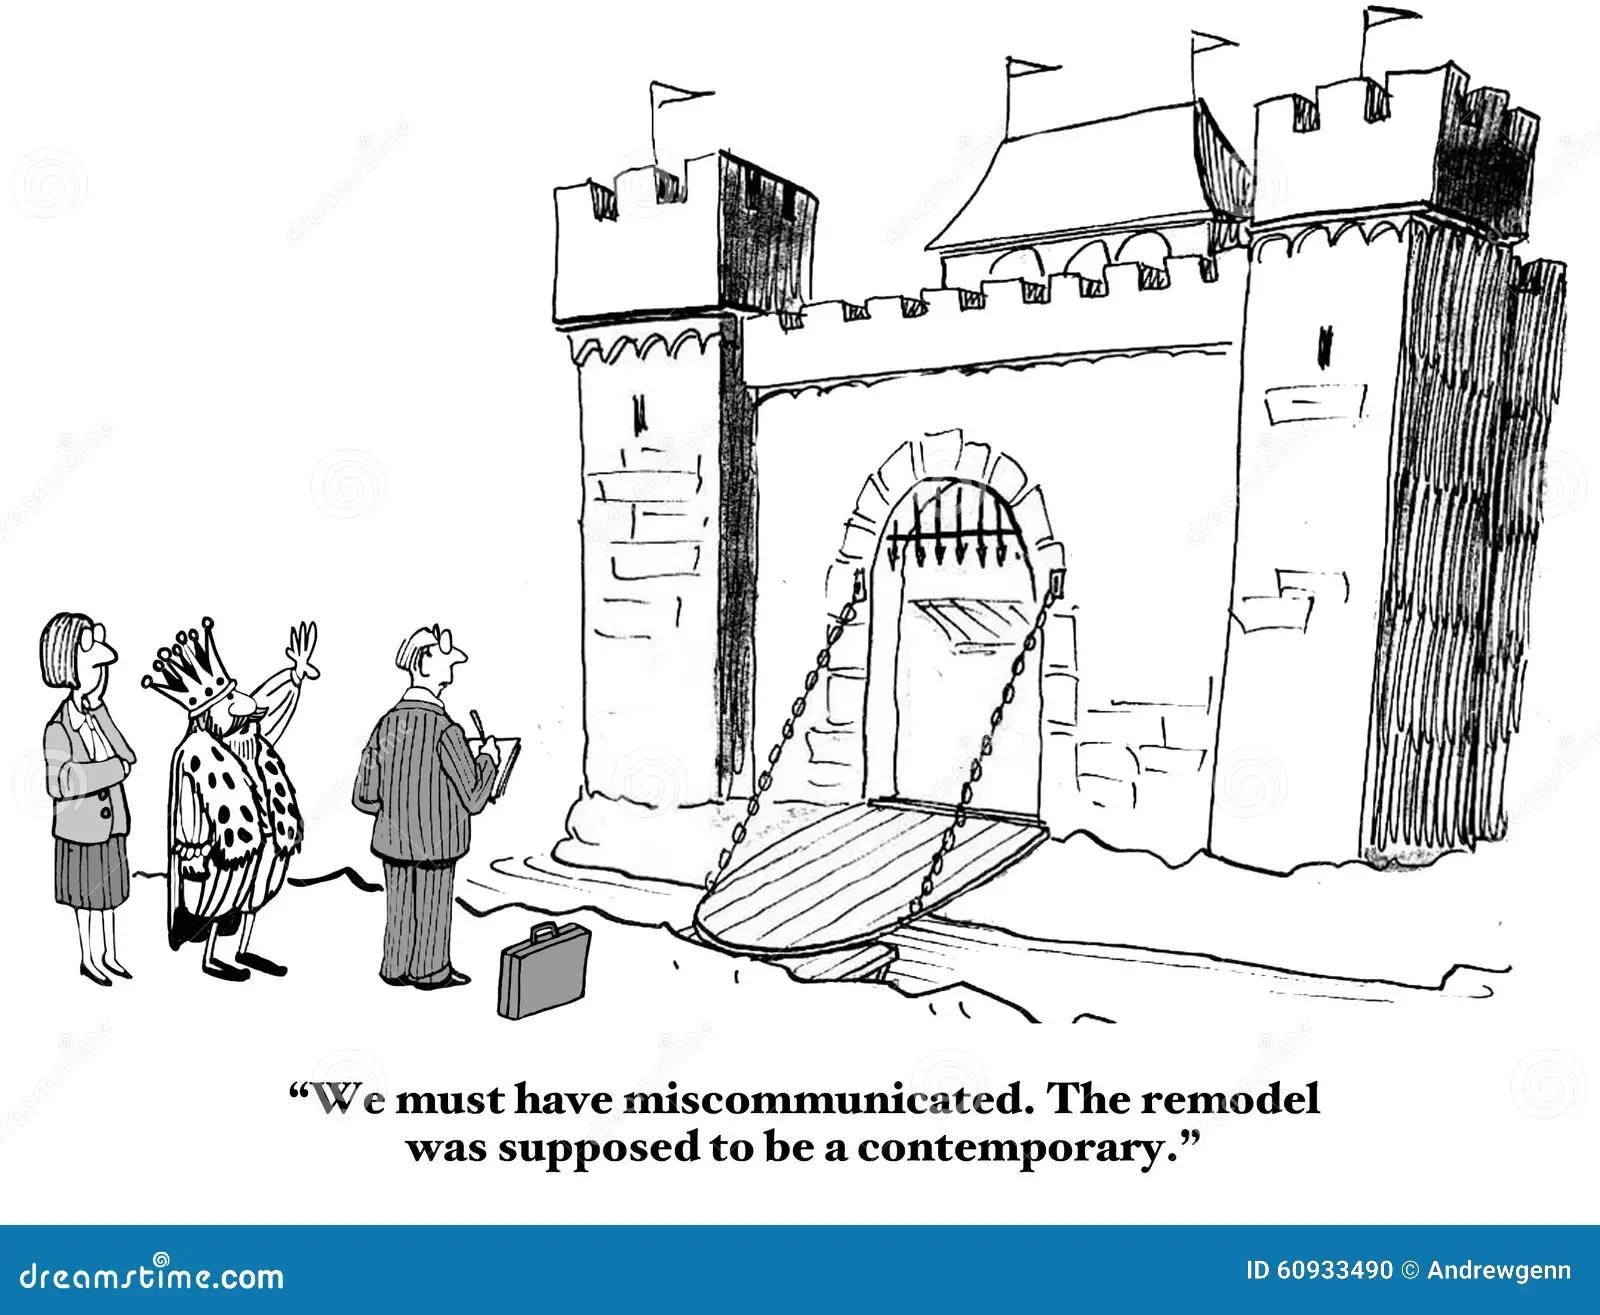 Miscommunication Cartoons Illustrations Amp Vector Stock